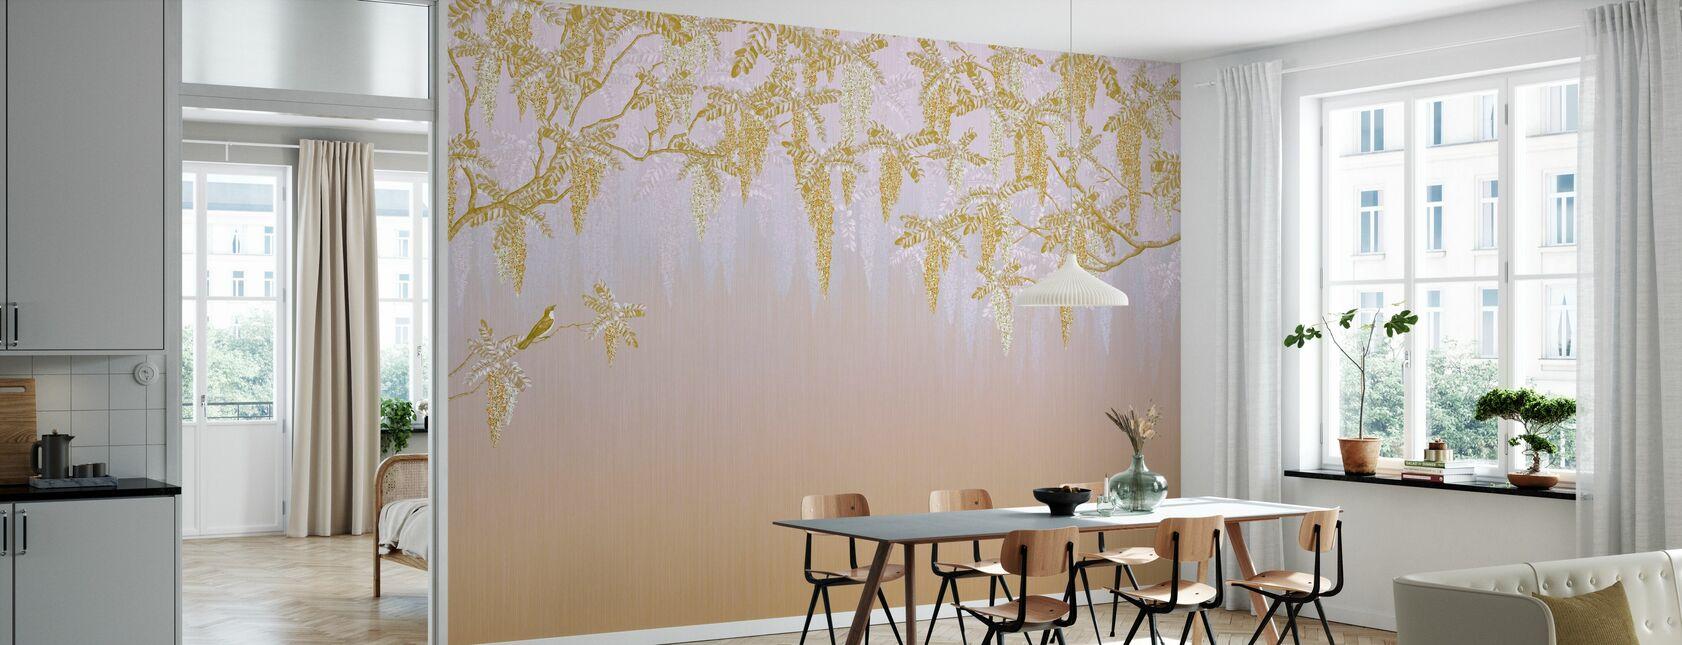 Wisteria - Yellow - Wallpaper - Kitchen